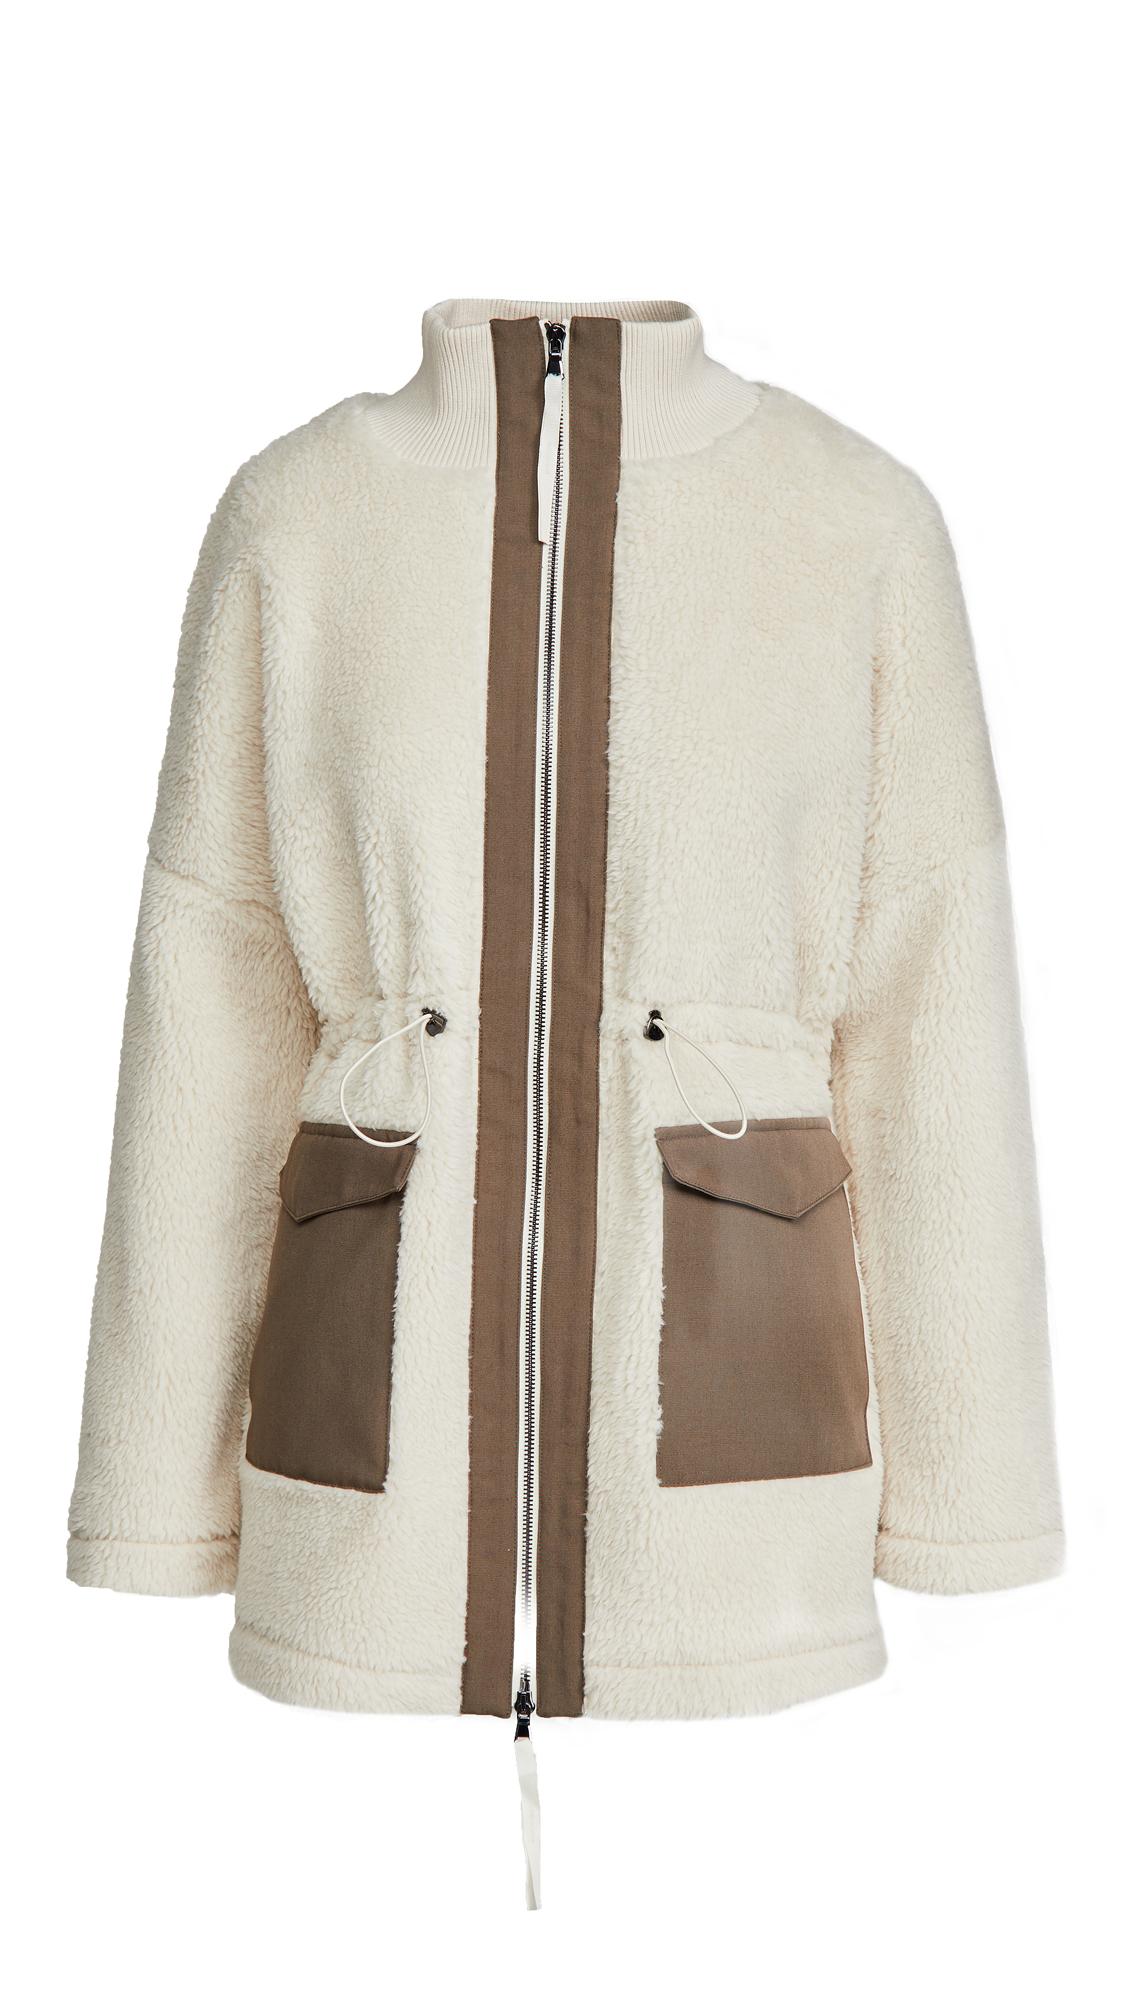 Varley Woodgreen Jacket